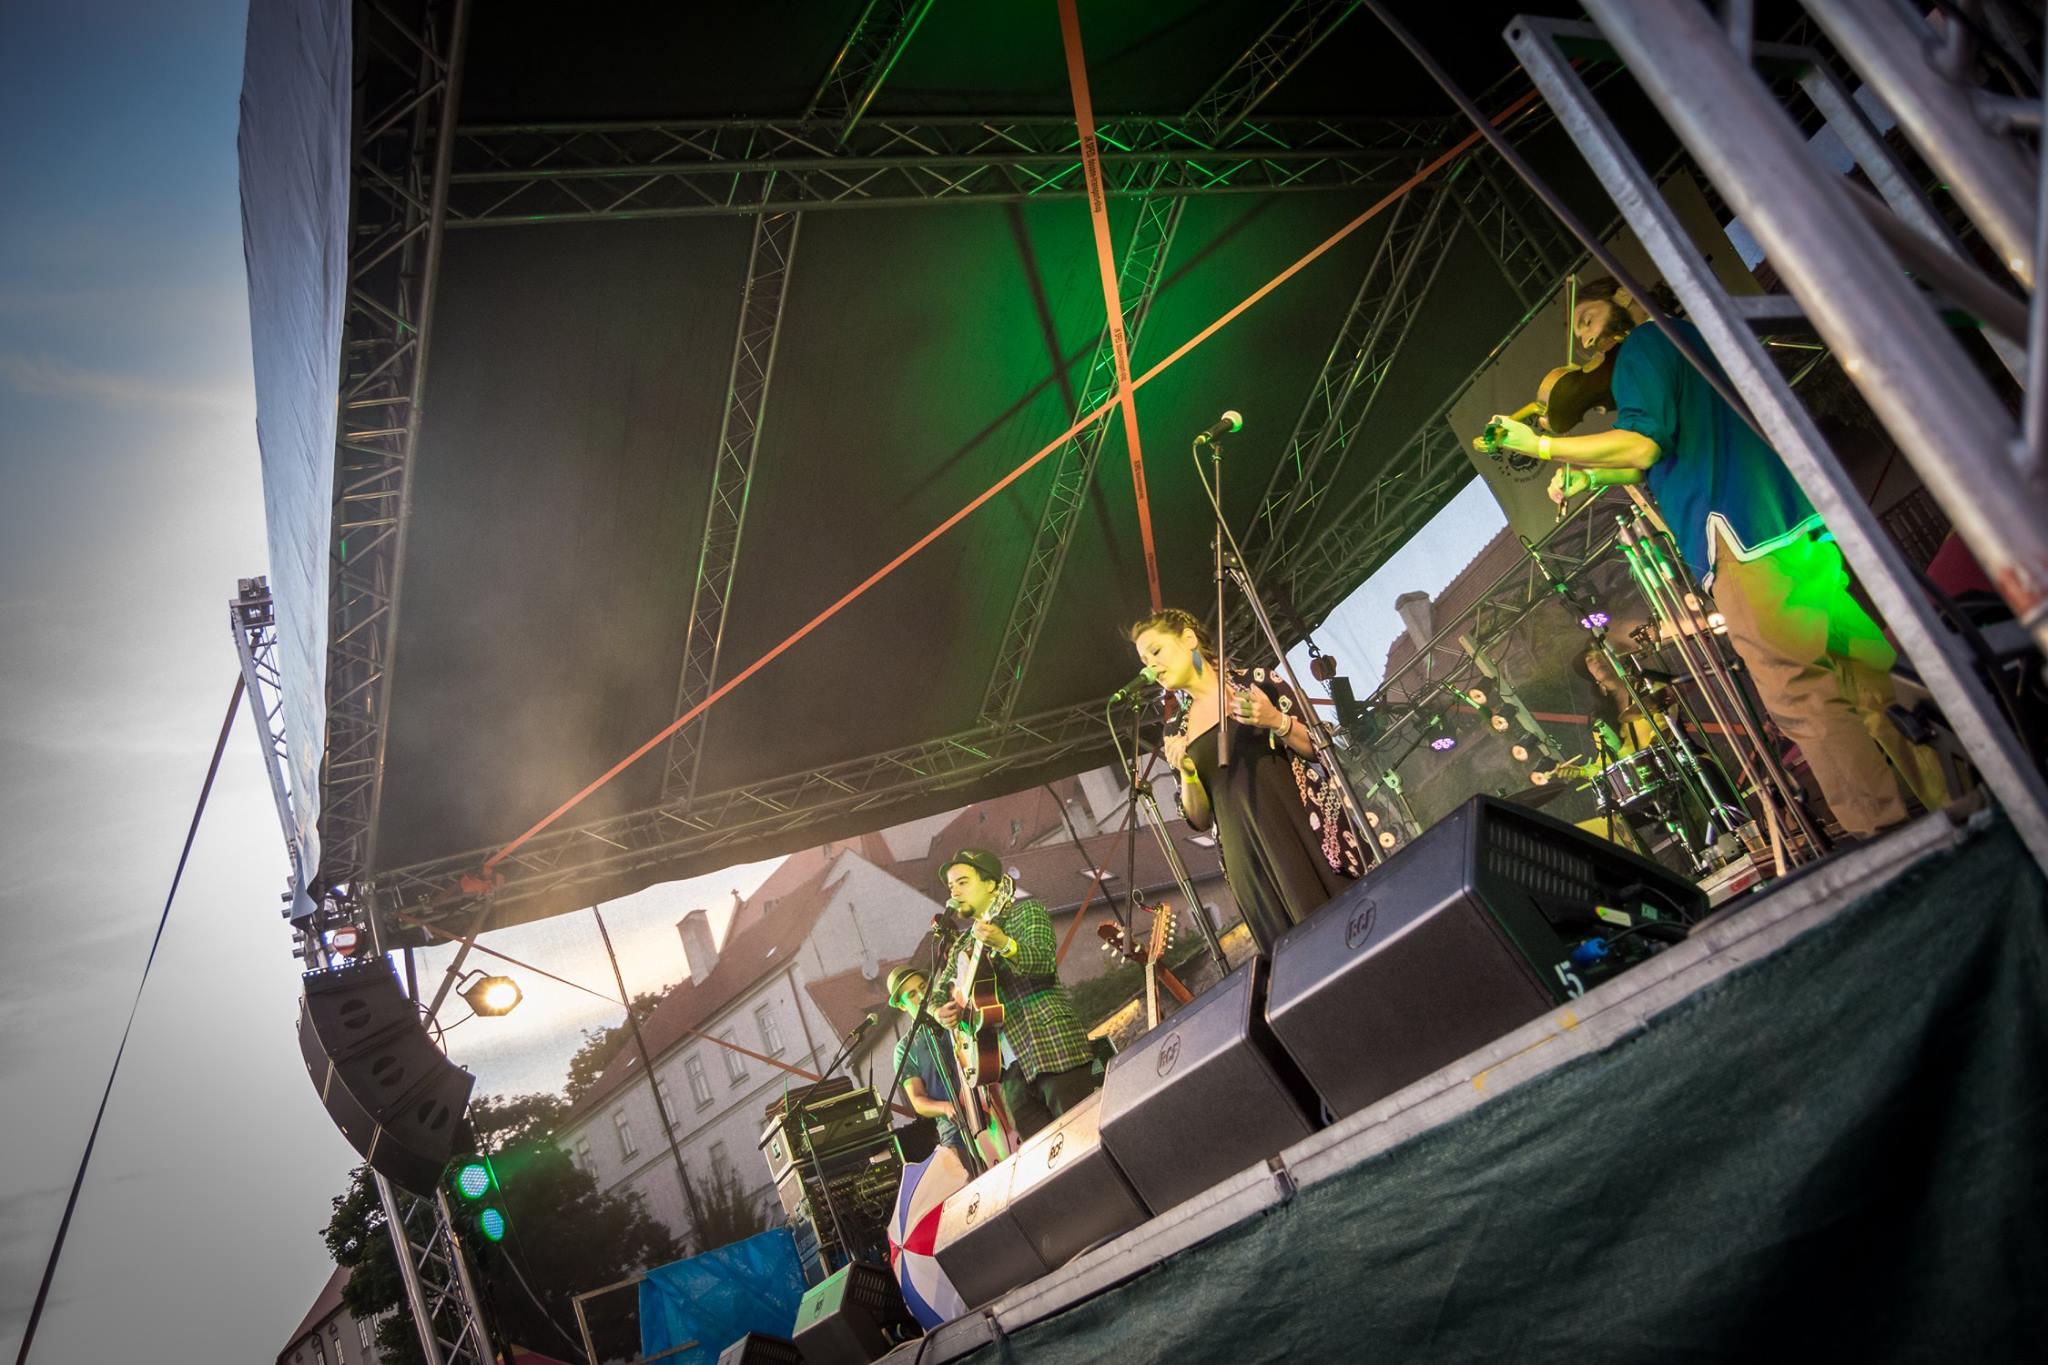 sramlfest-festival-znojmo-2017-019